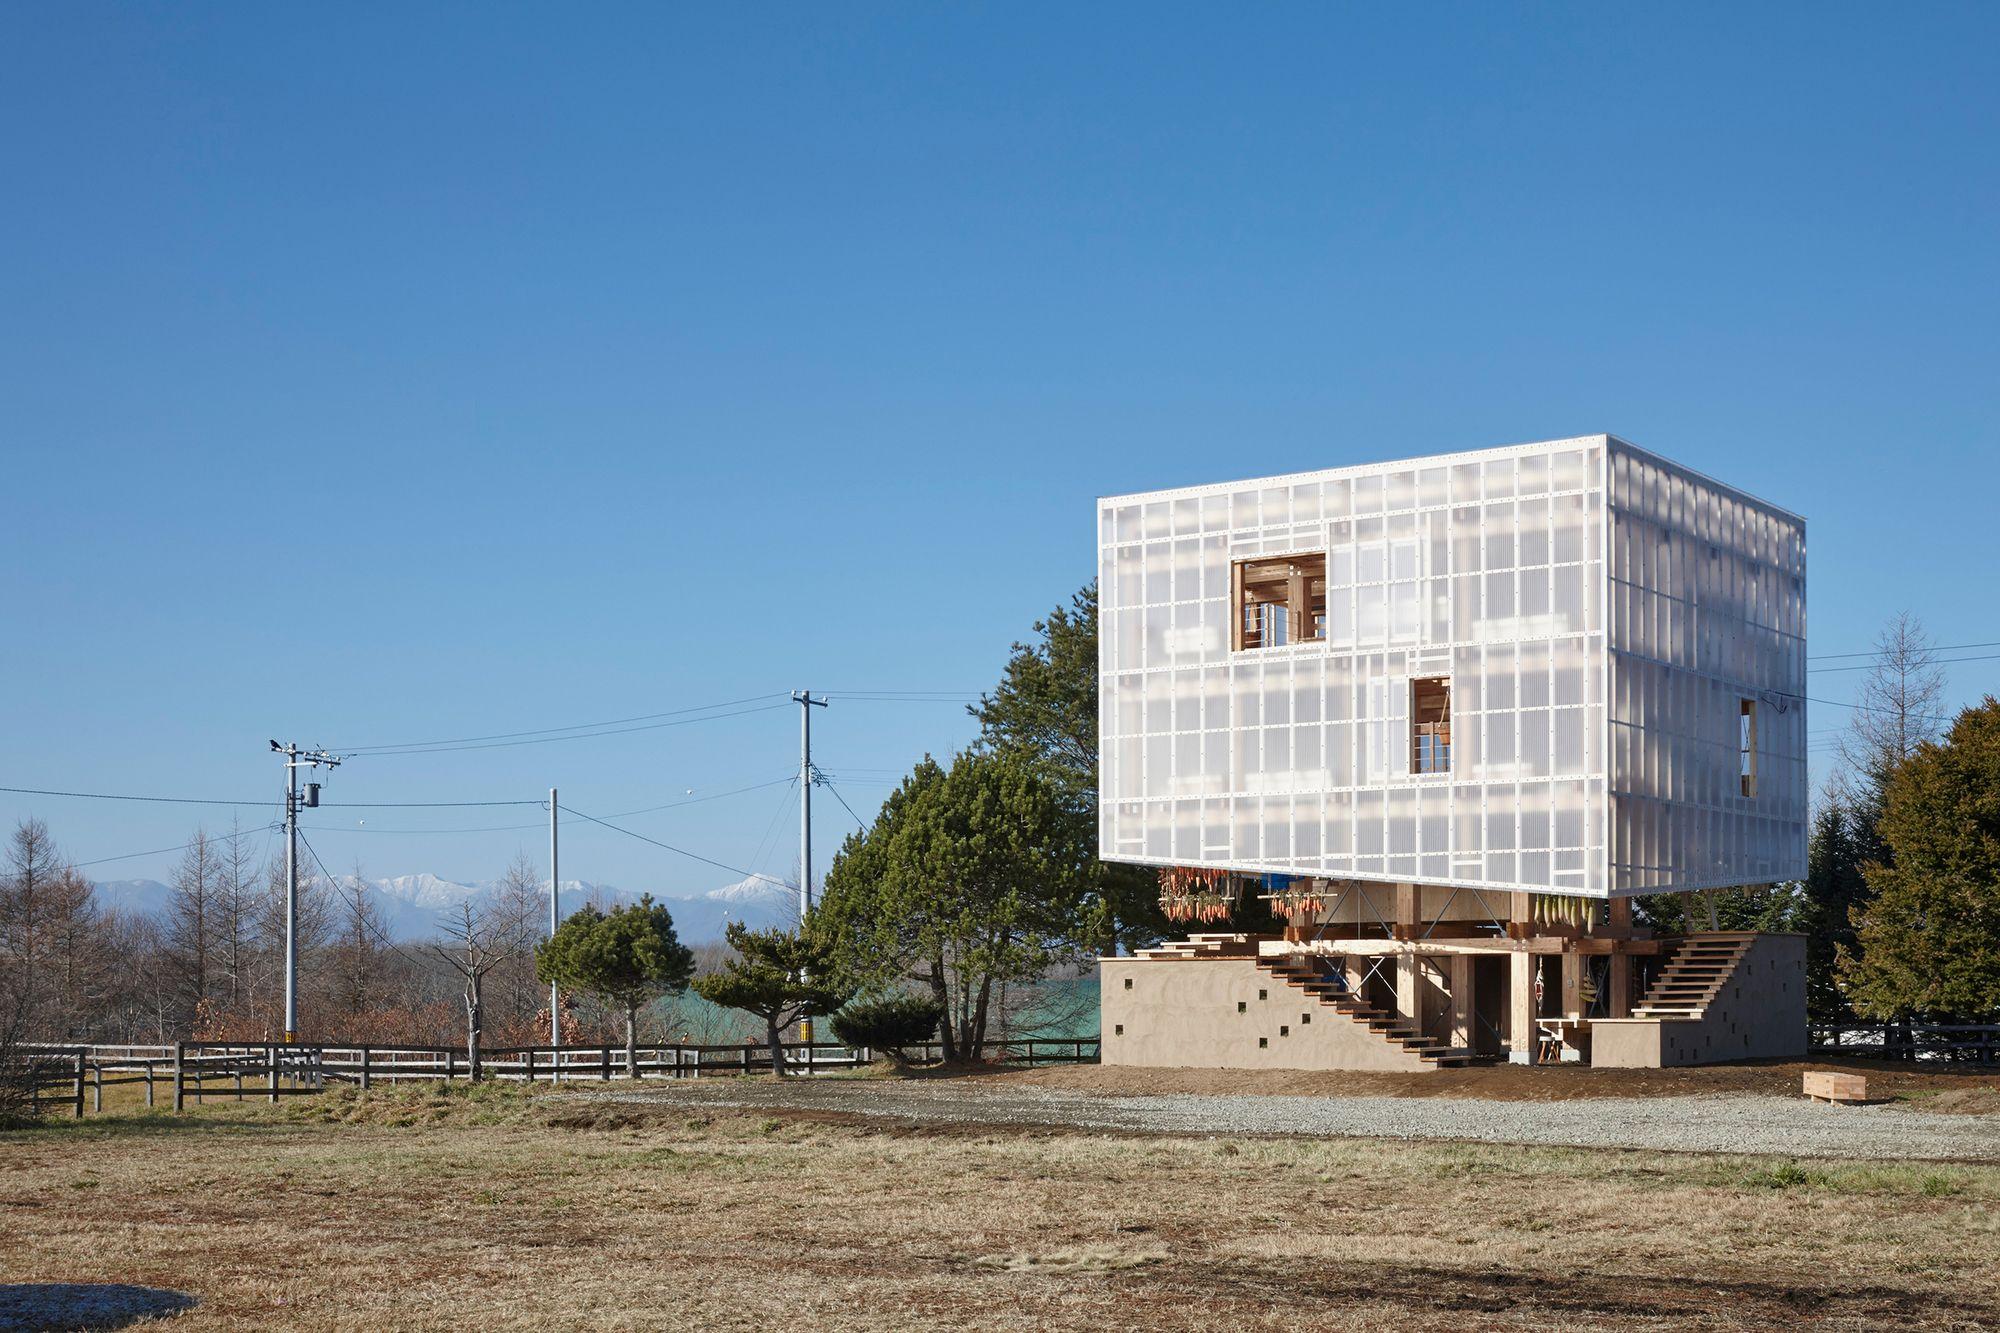 College of Environmental Design UC Berkeley + Kengo Kuma & Associates